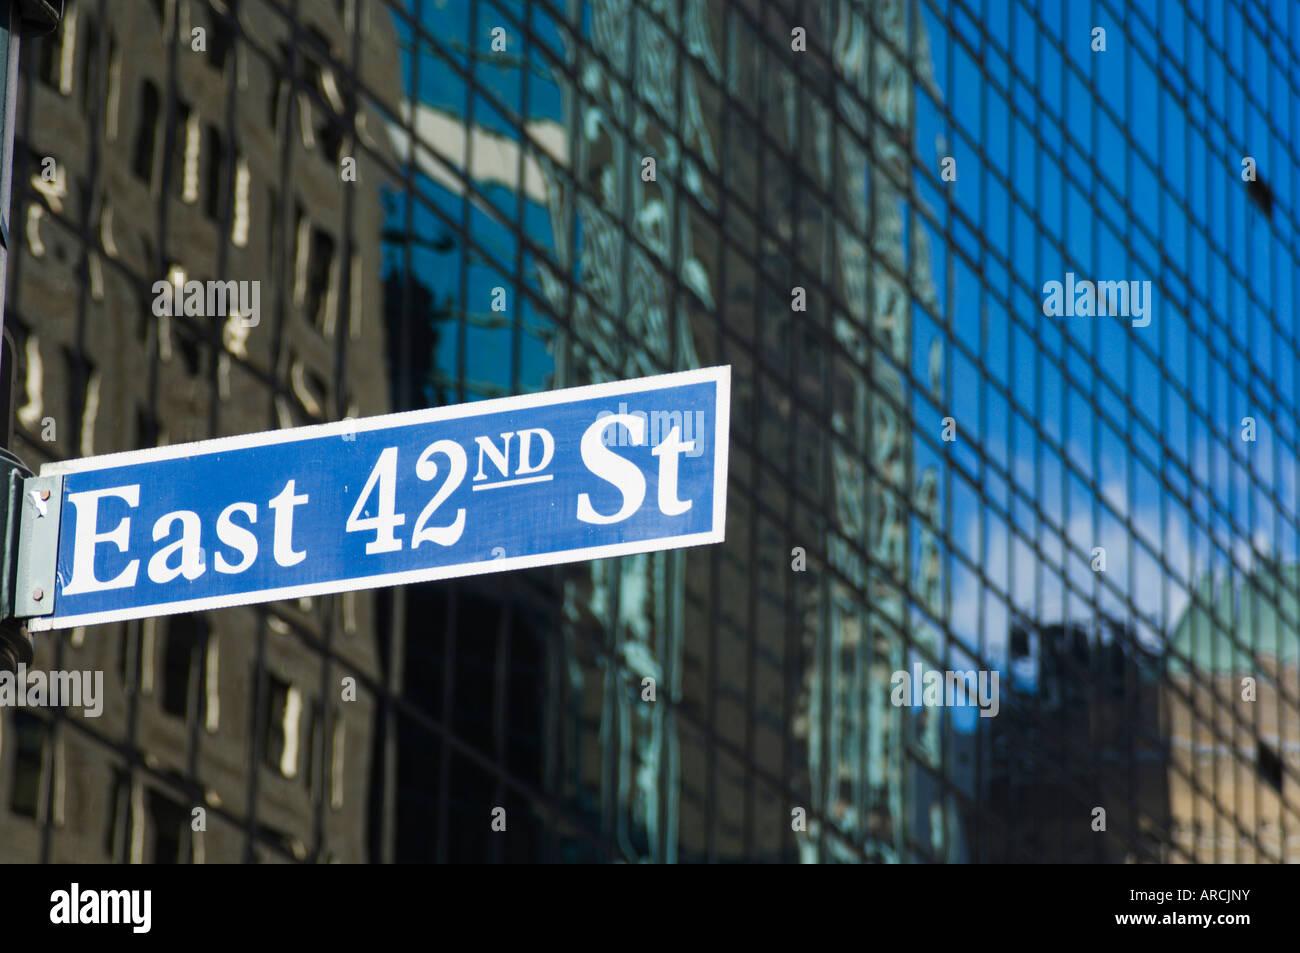 East 42nd Street sign, Manhattan, New York City, New York, United States of America, North America - Stock Image